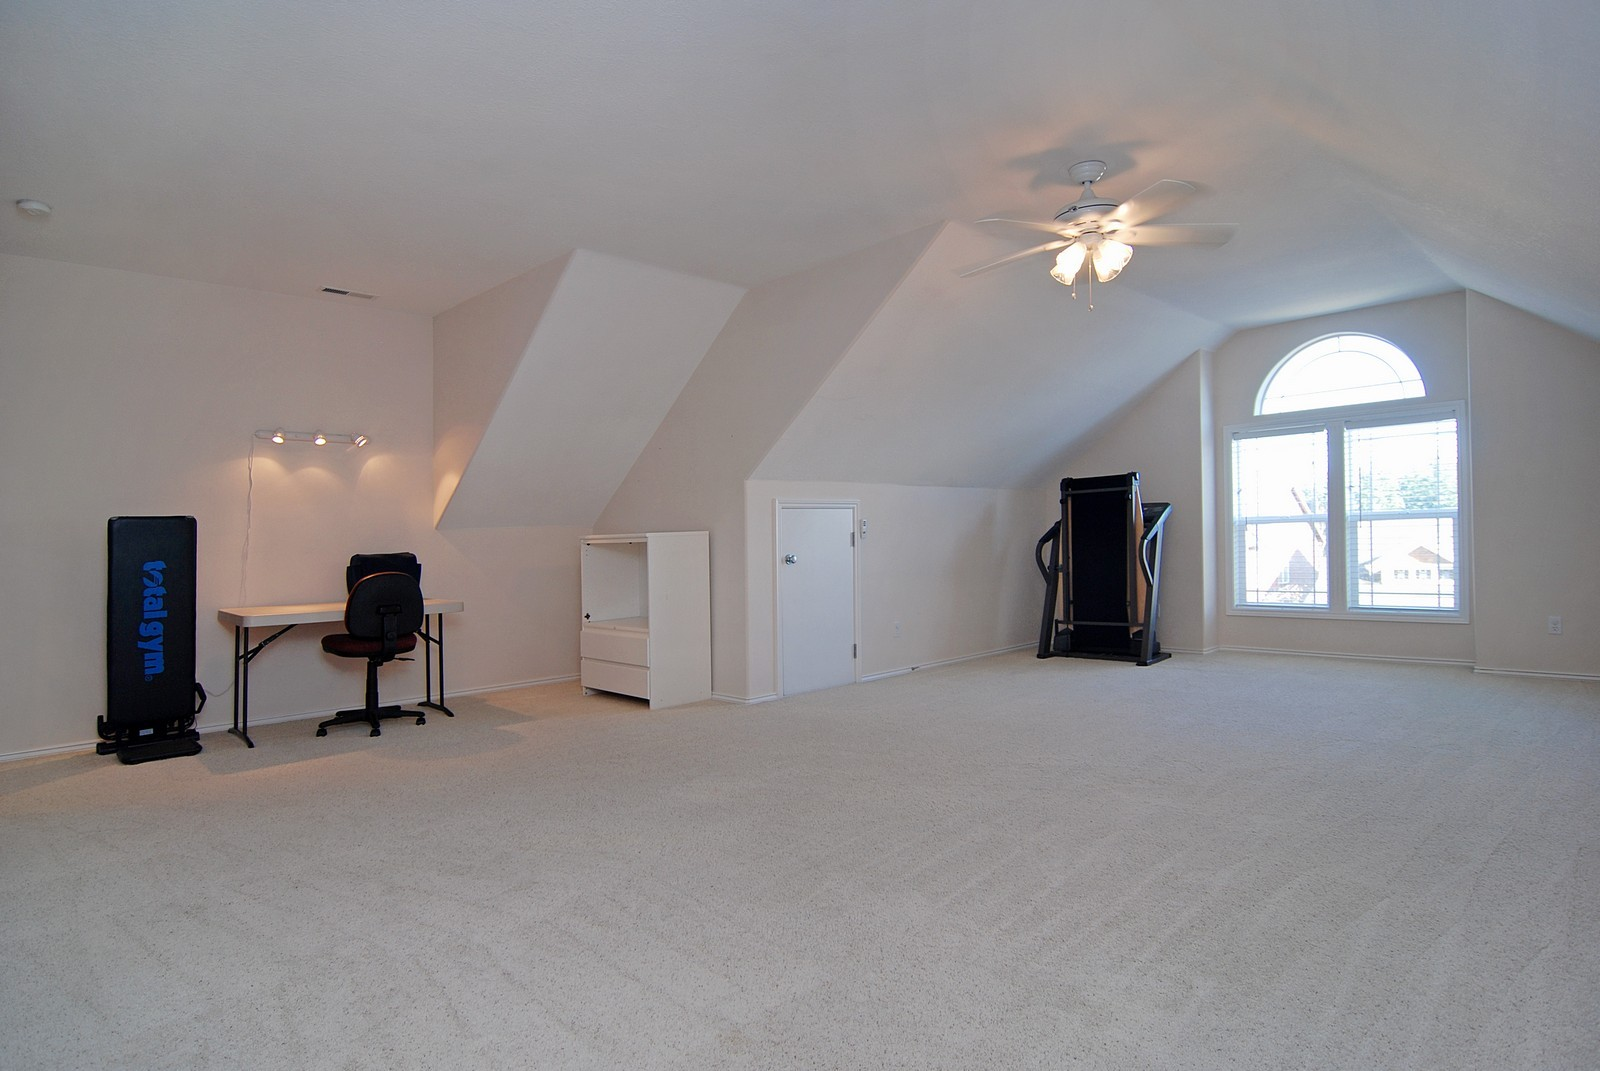 Real Estate Photography - 22553 SW 106th Ave, Tualatin, OR, 97062 - Bonus Room